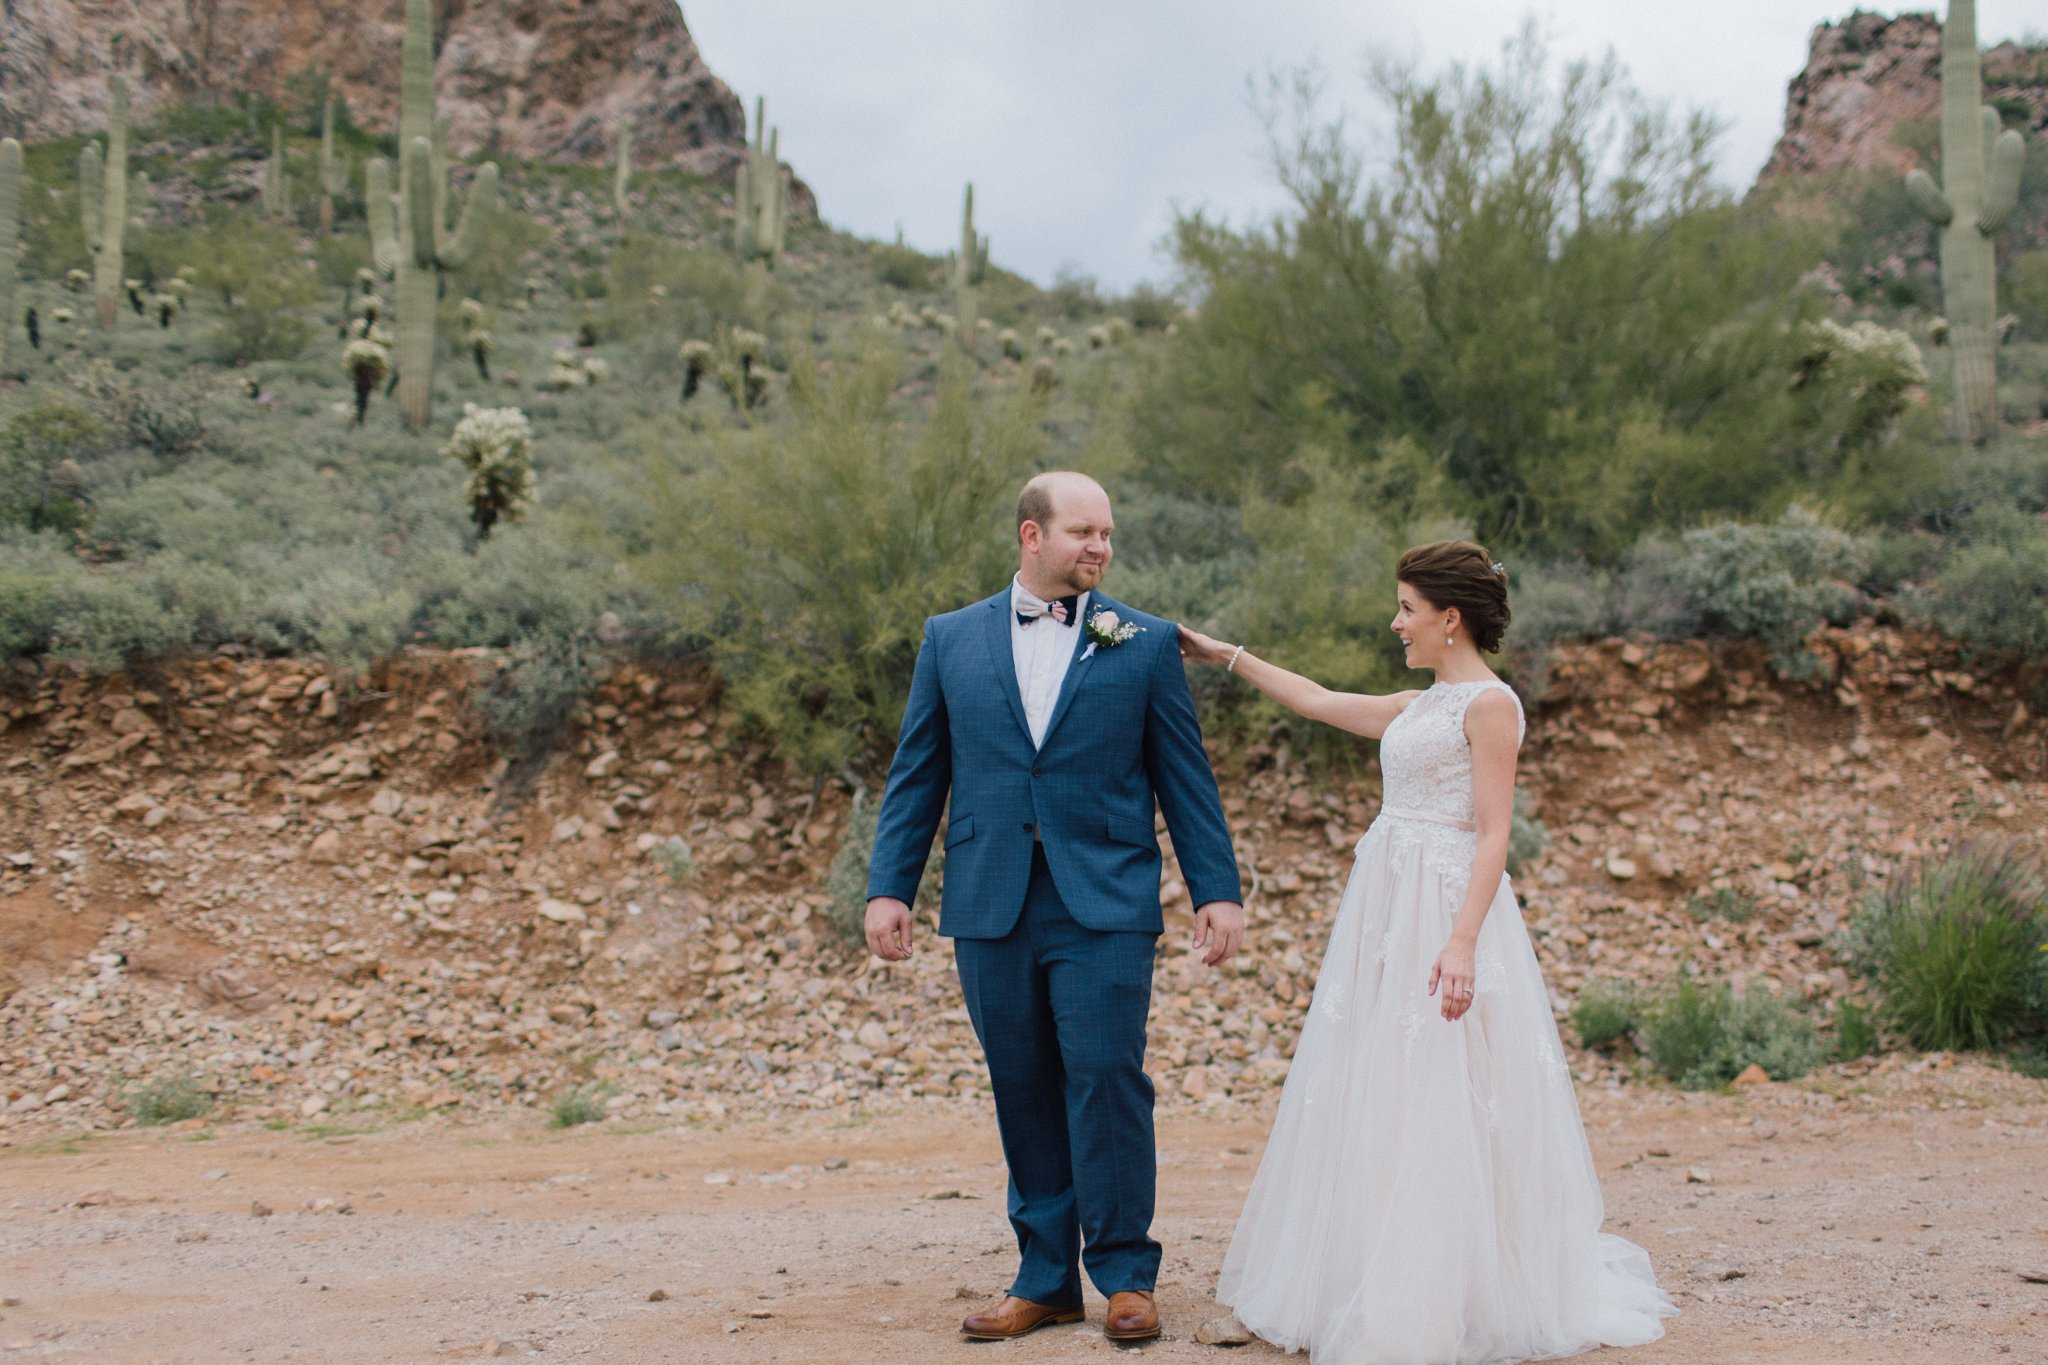 desert first look at gold canyon golf resort & spa wedding photos